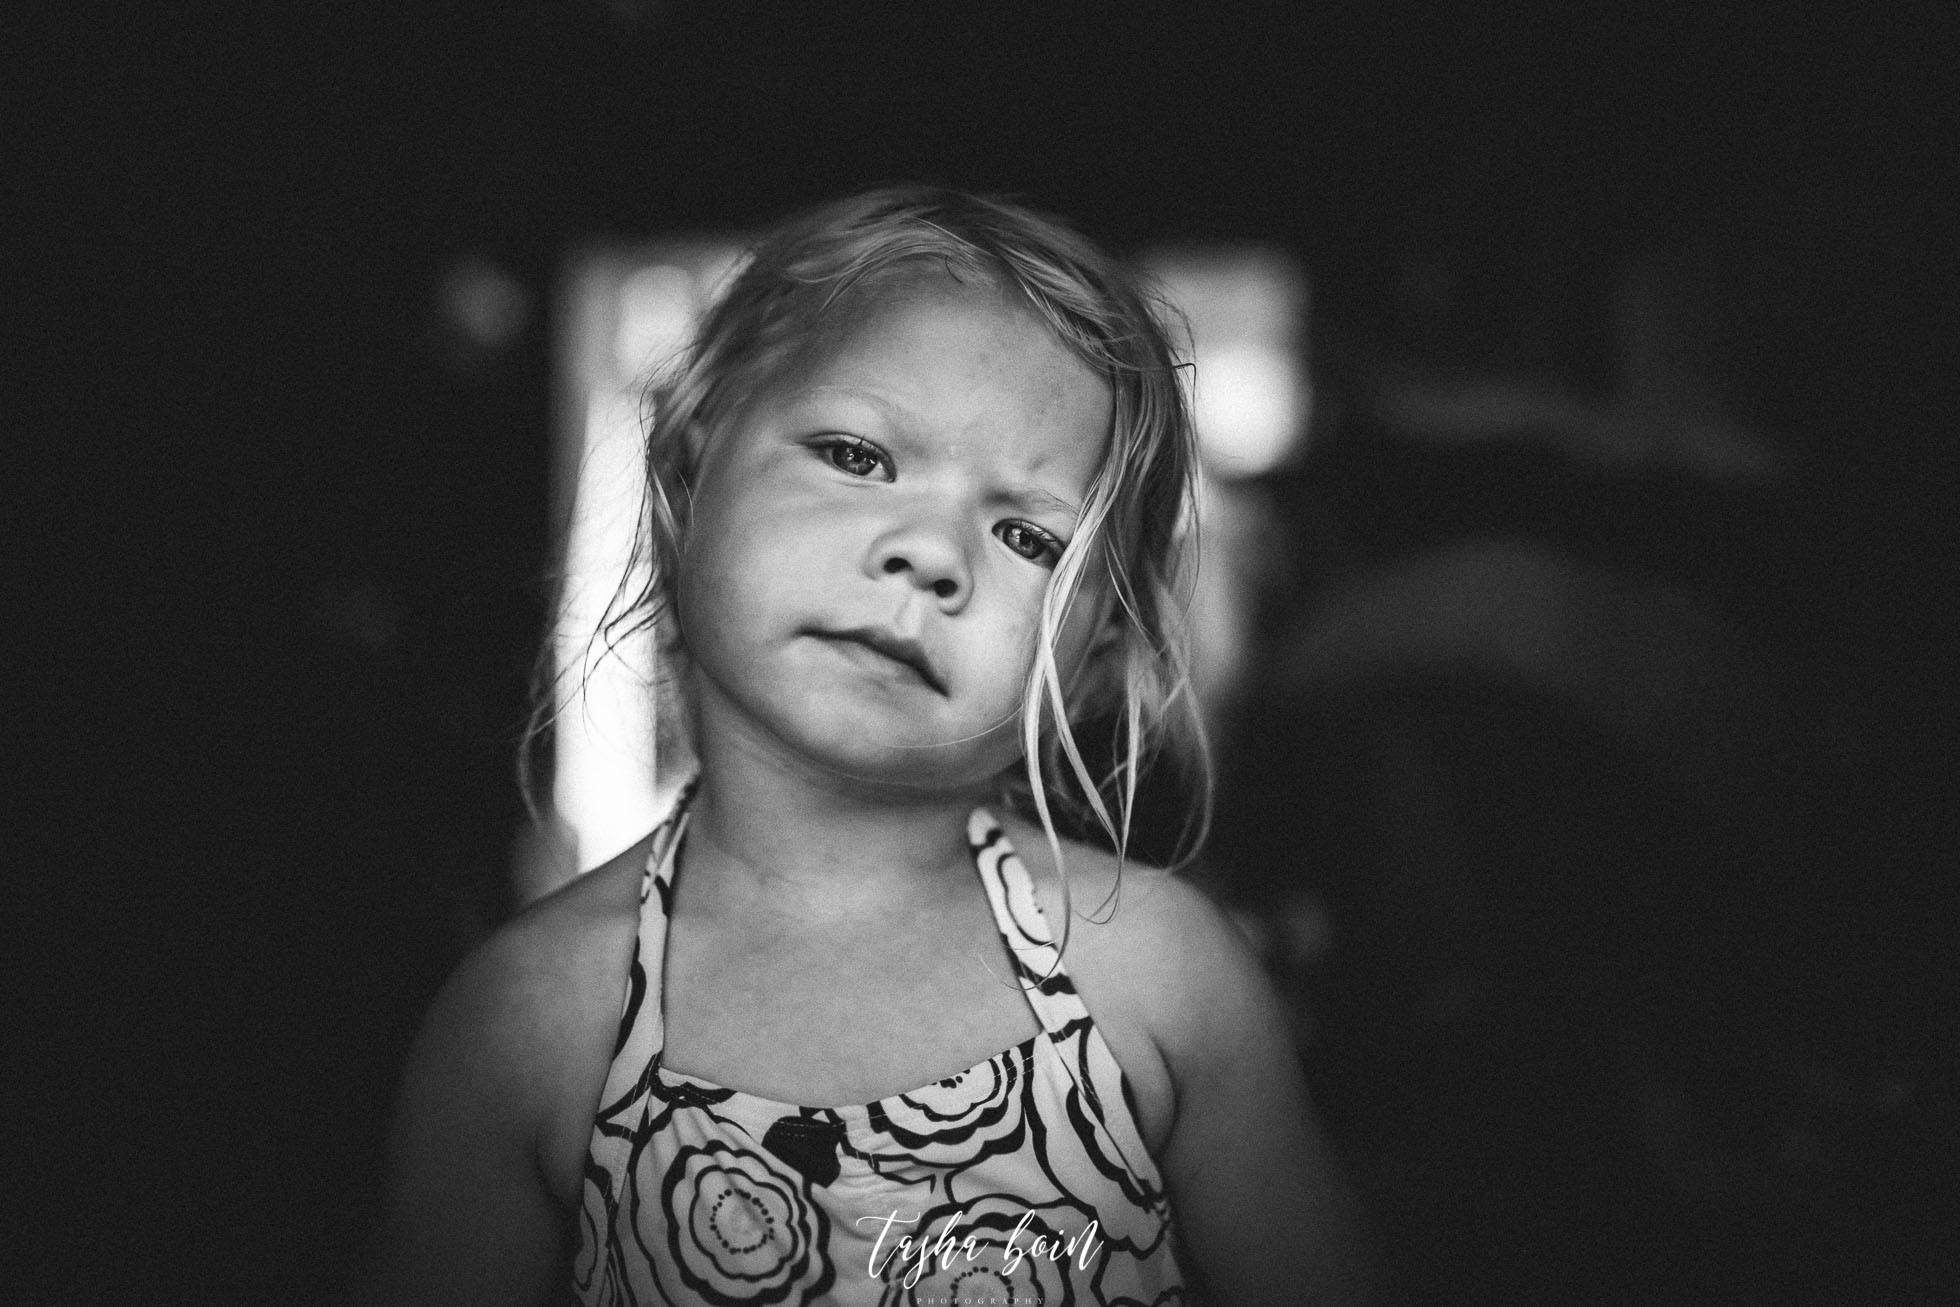 black and white child portrait photography pose tasha boin